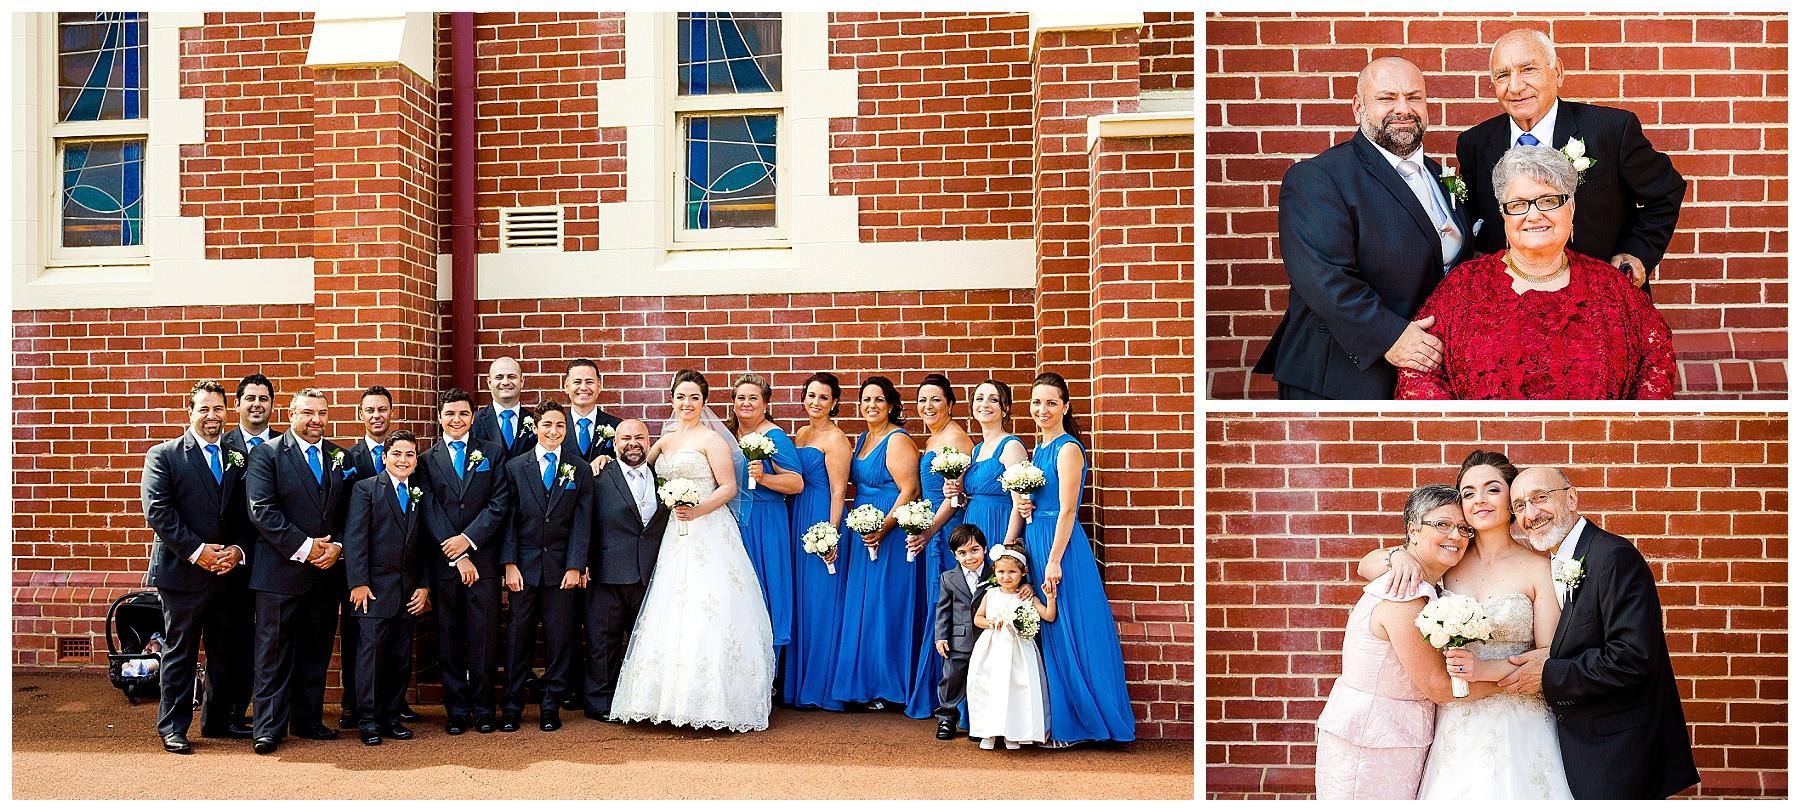 wedding at christ the king